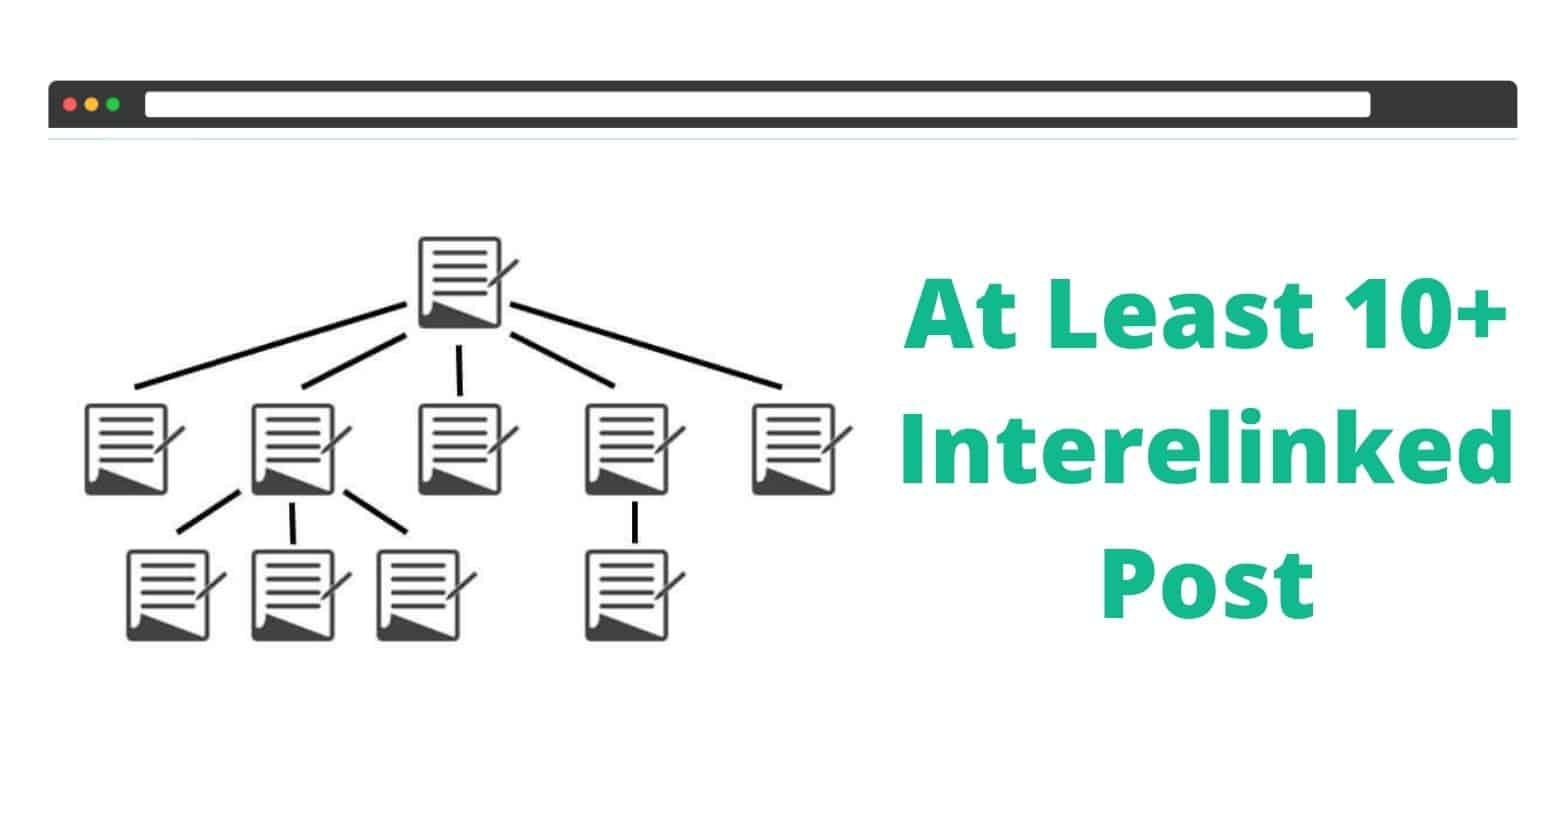 interlinked post